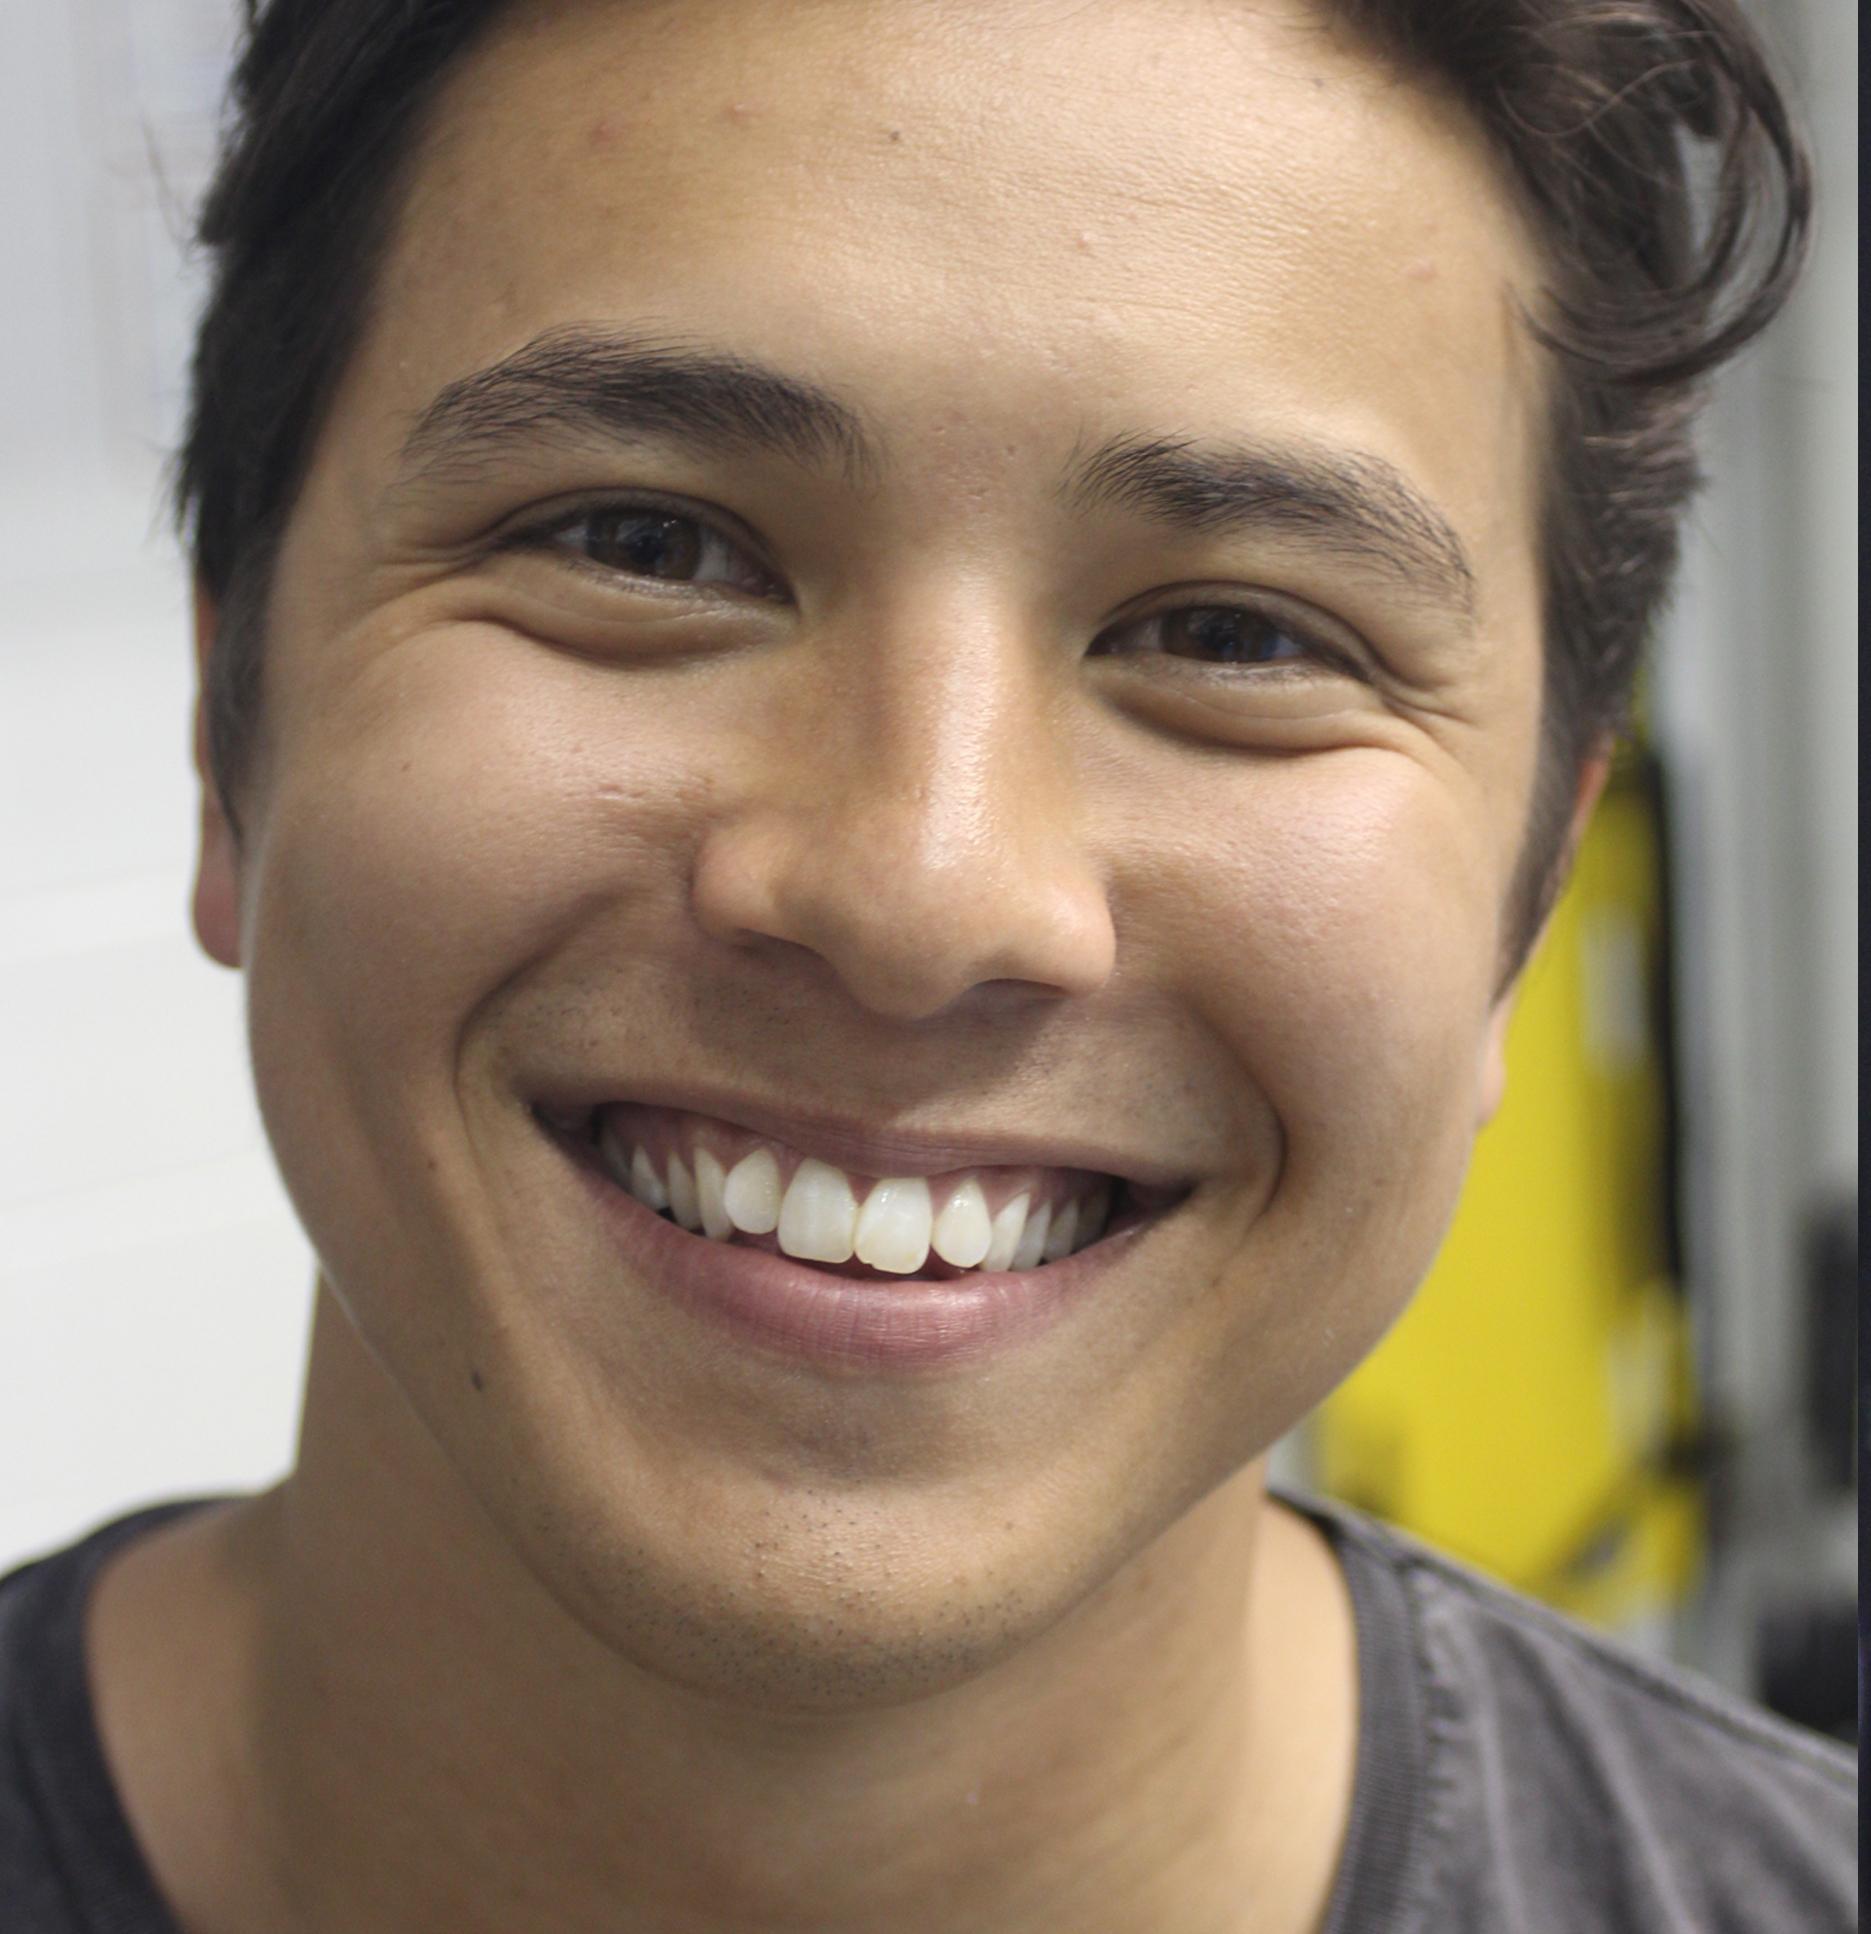 Chase Yi